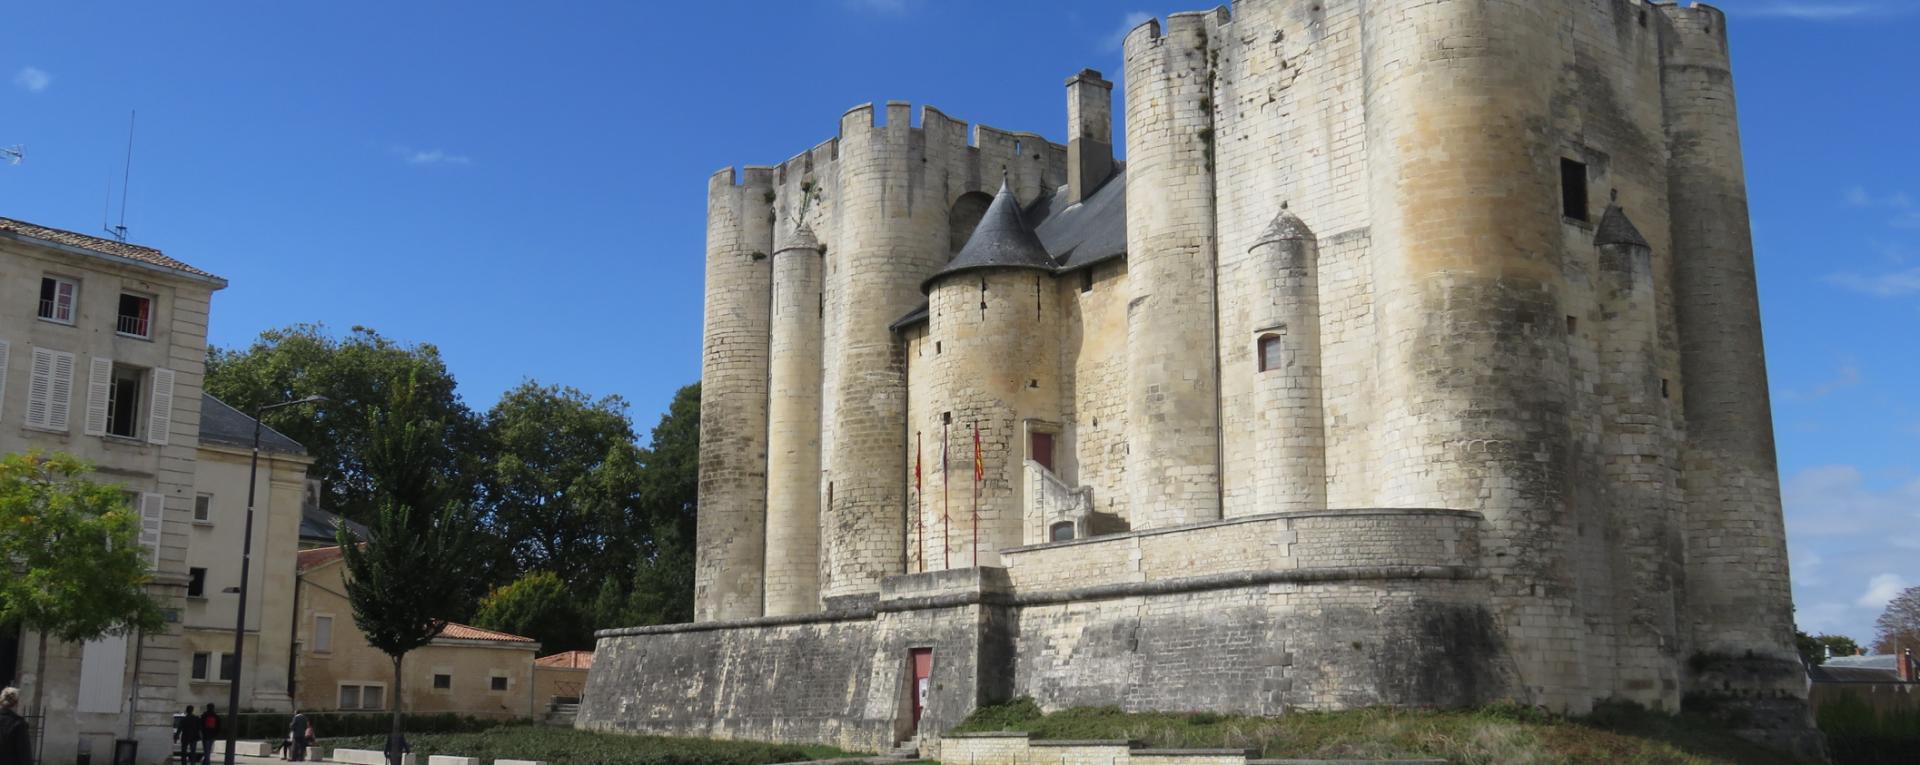 Musée du Donjon - Niort [79]